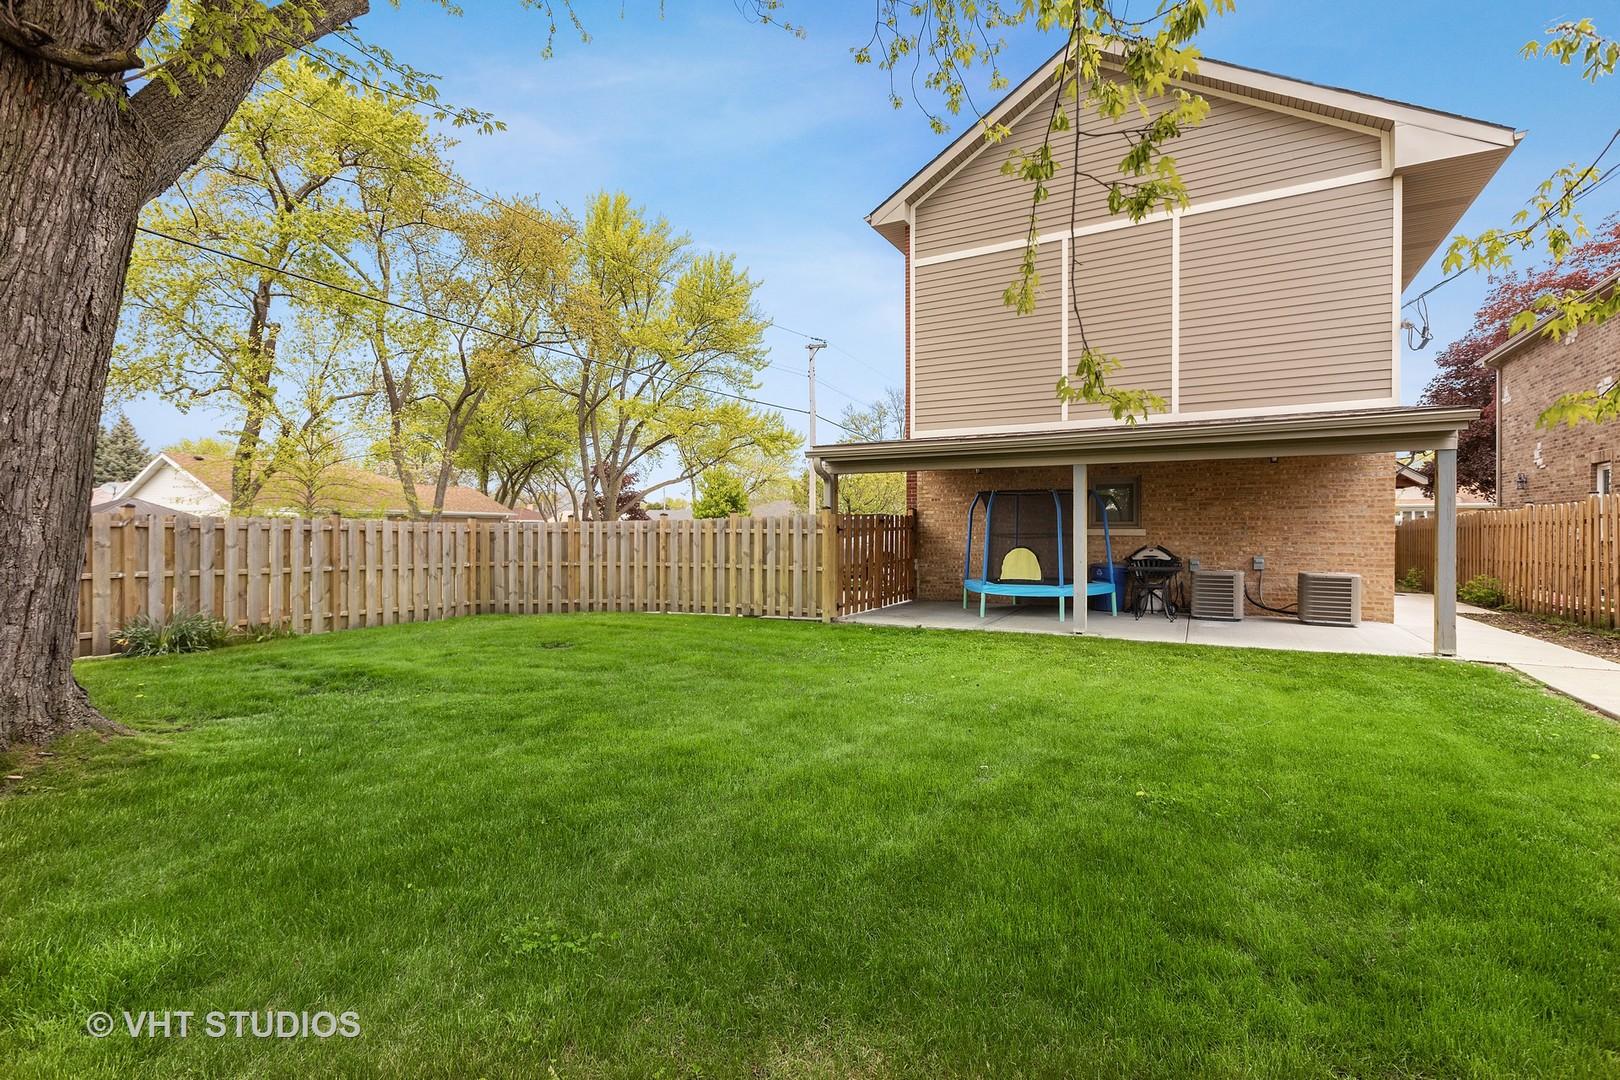 7805 West MONROE, Niles, Illinois, 60714